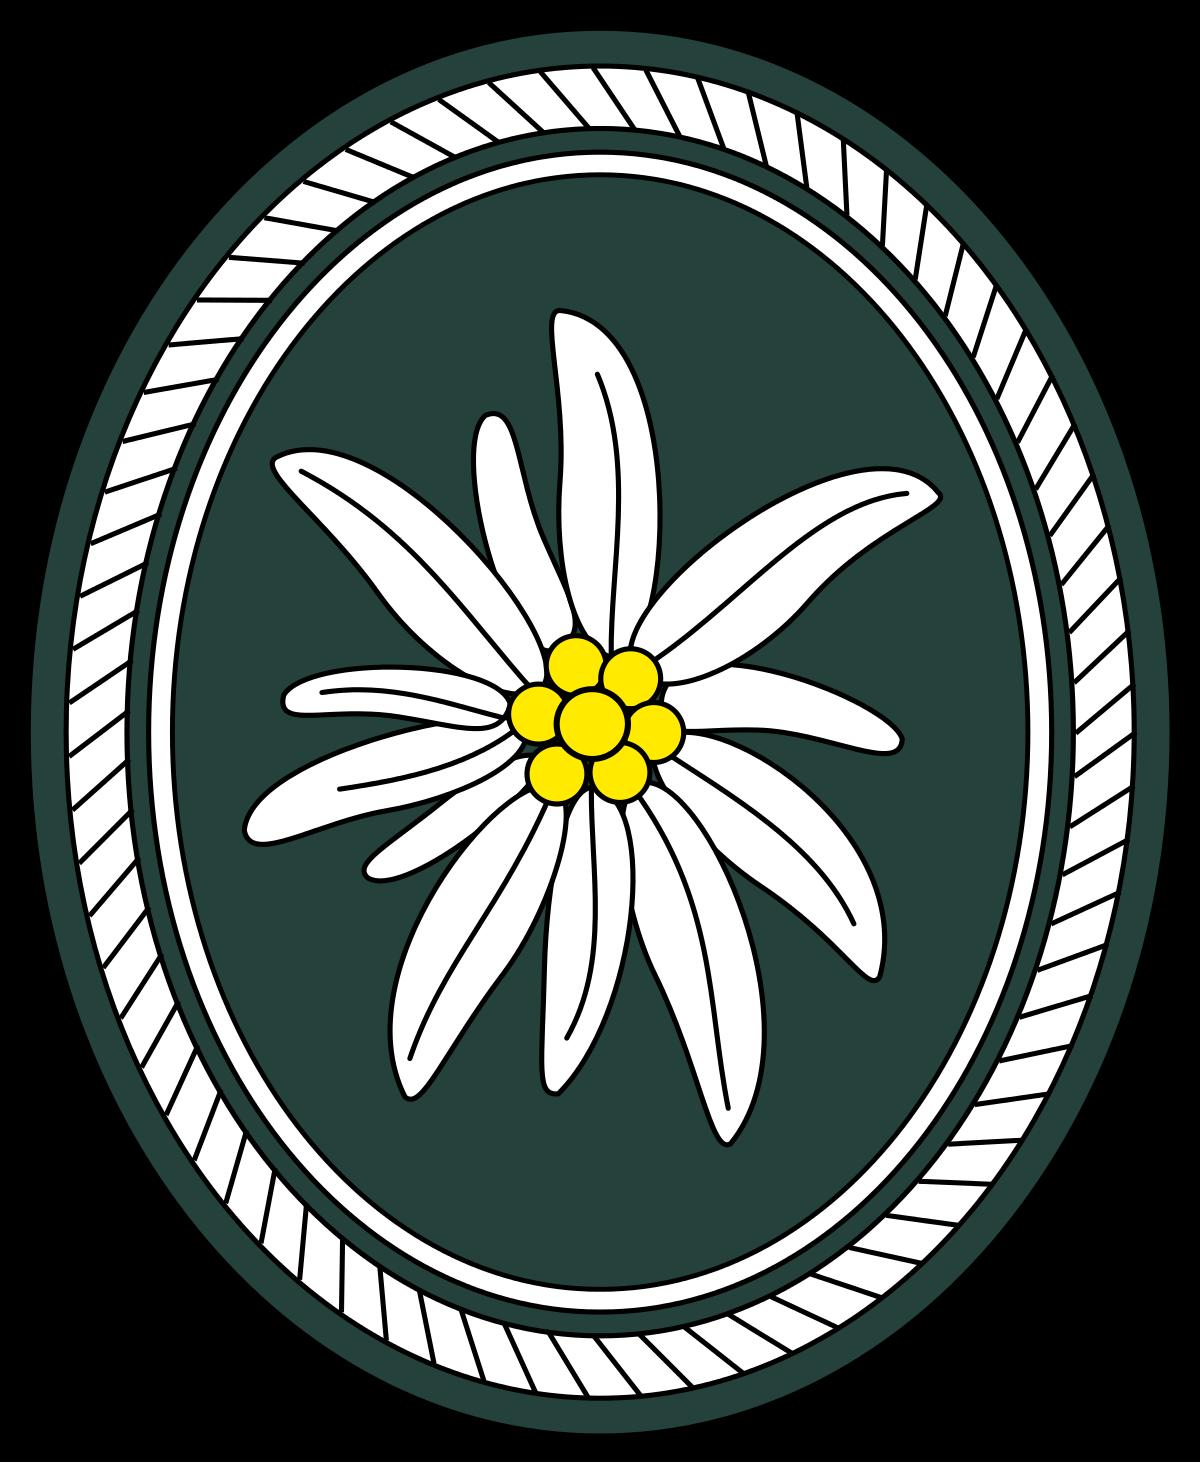 1st Mountain Division (Bundeswehr).